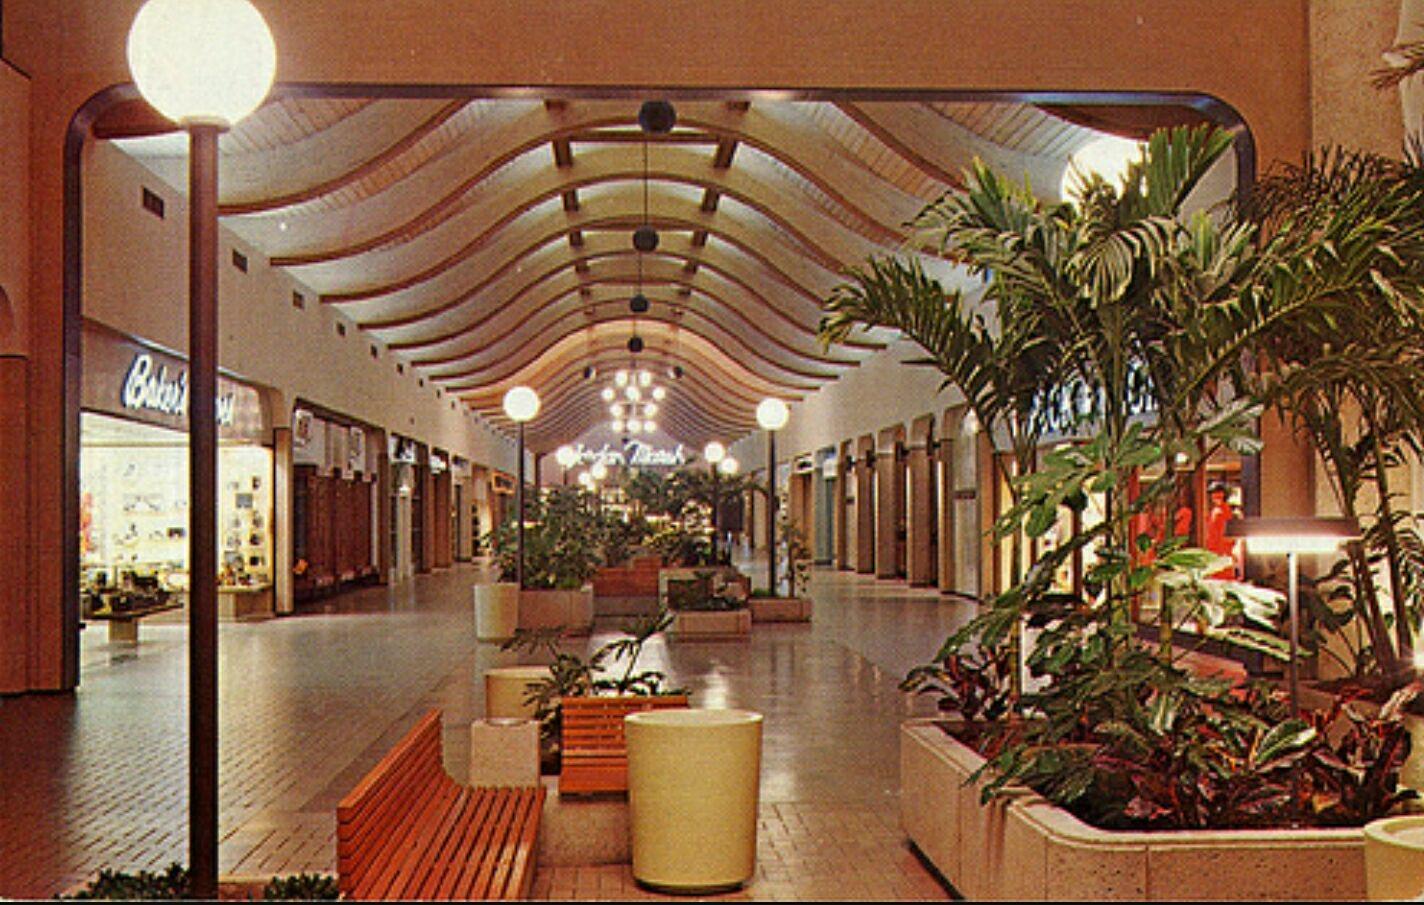 Original one-floor Burlington Mall